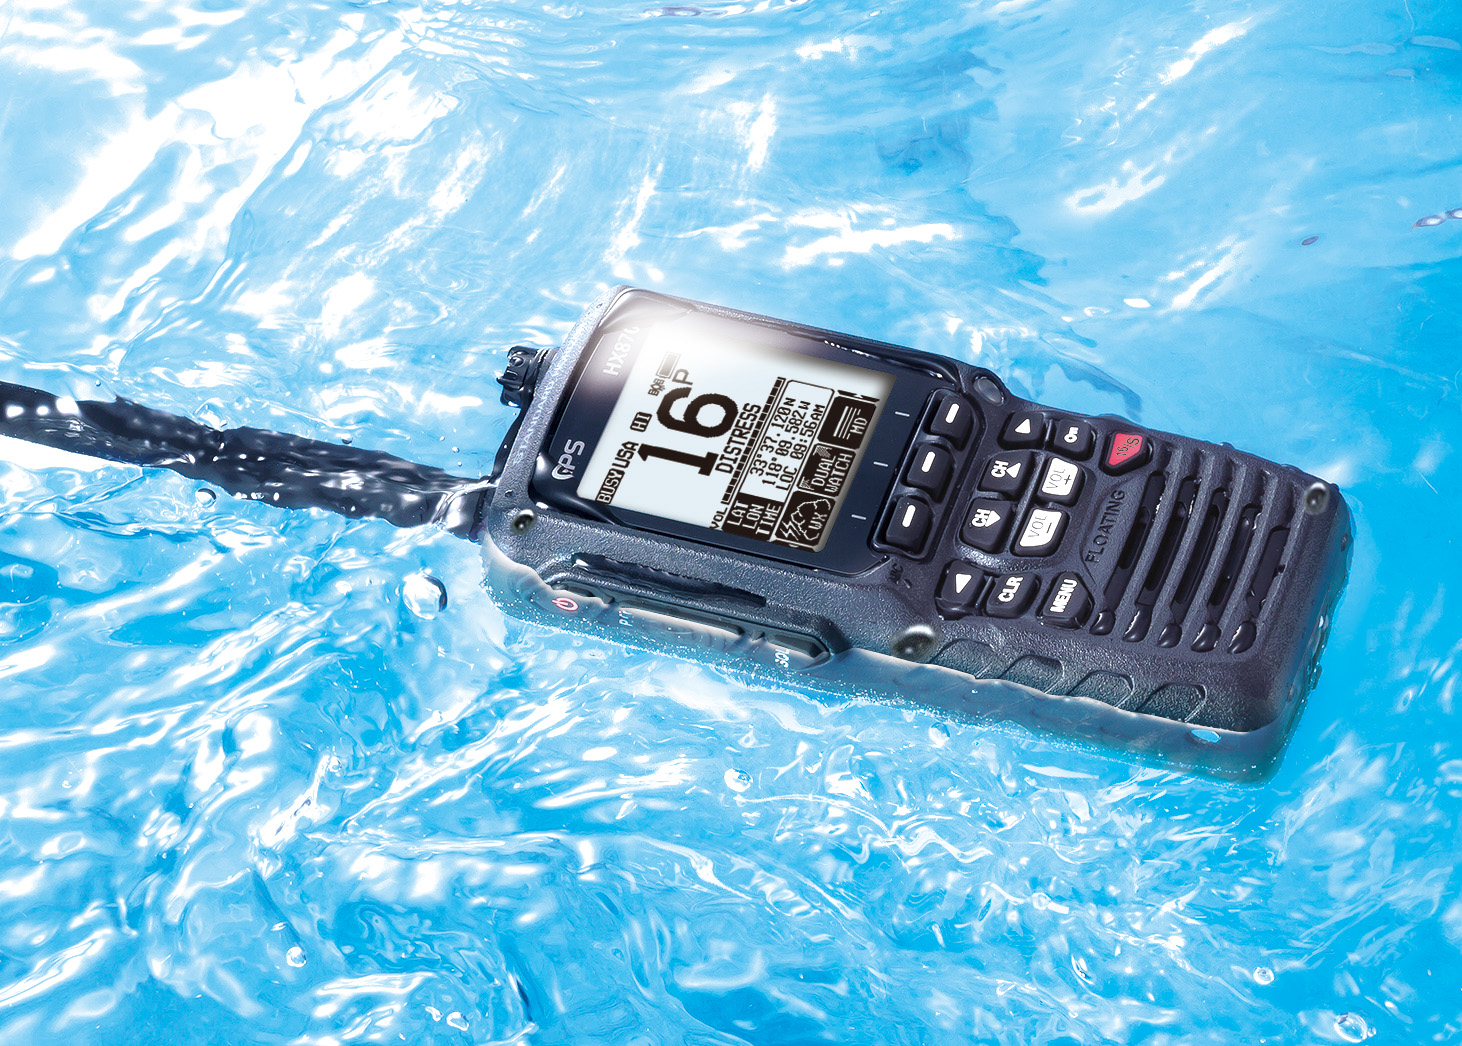 Standard Horizon HX870E Handfunkgerät mit integriertem GPS schwimmend